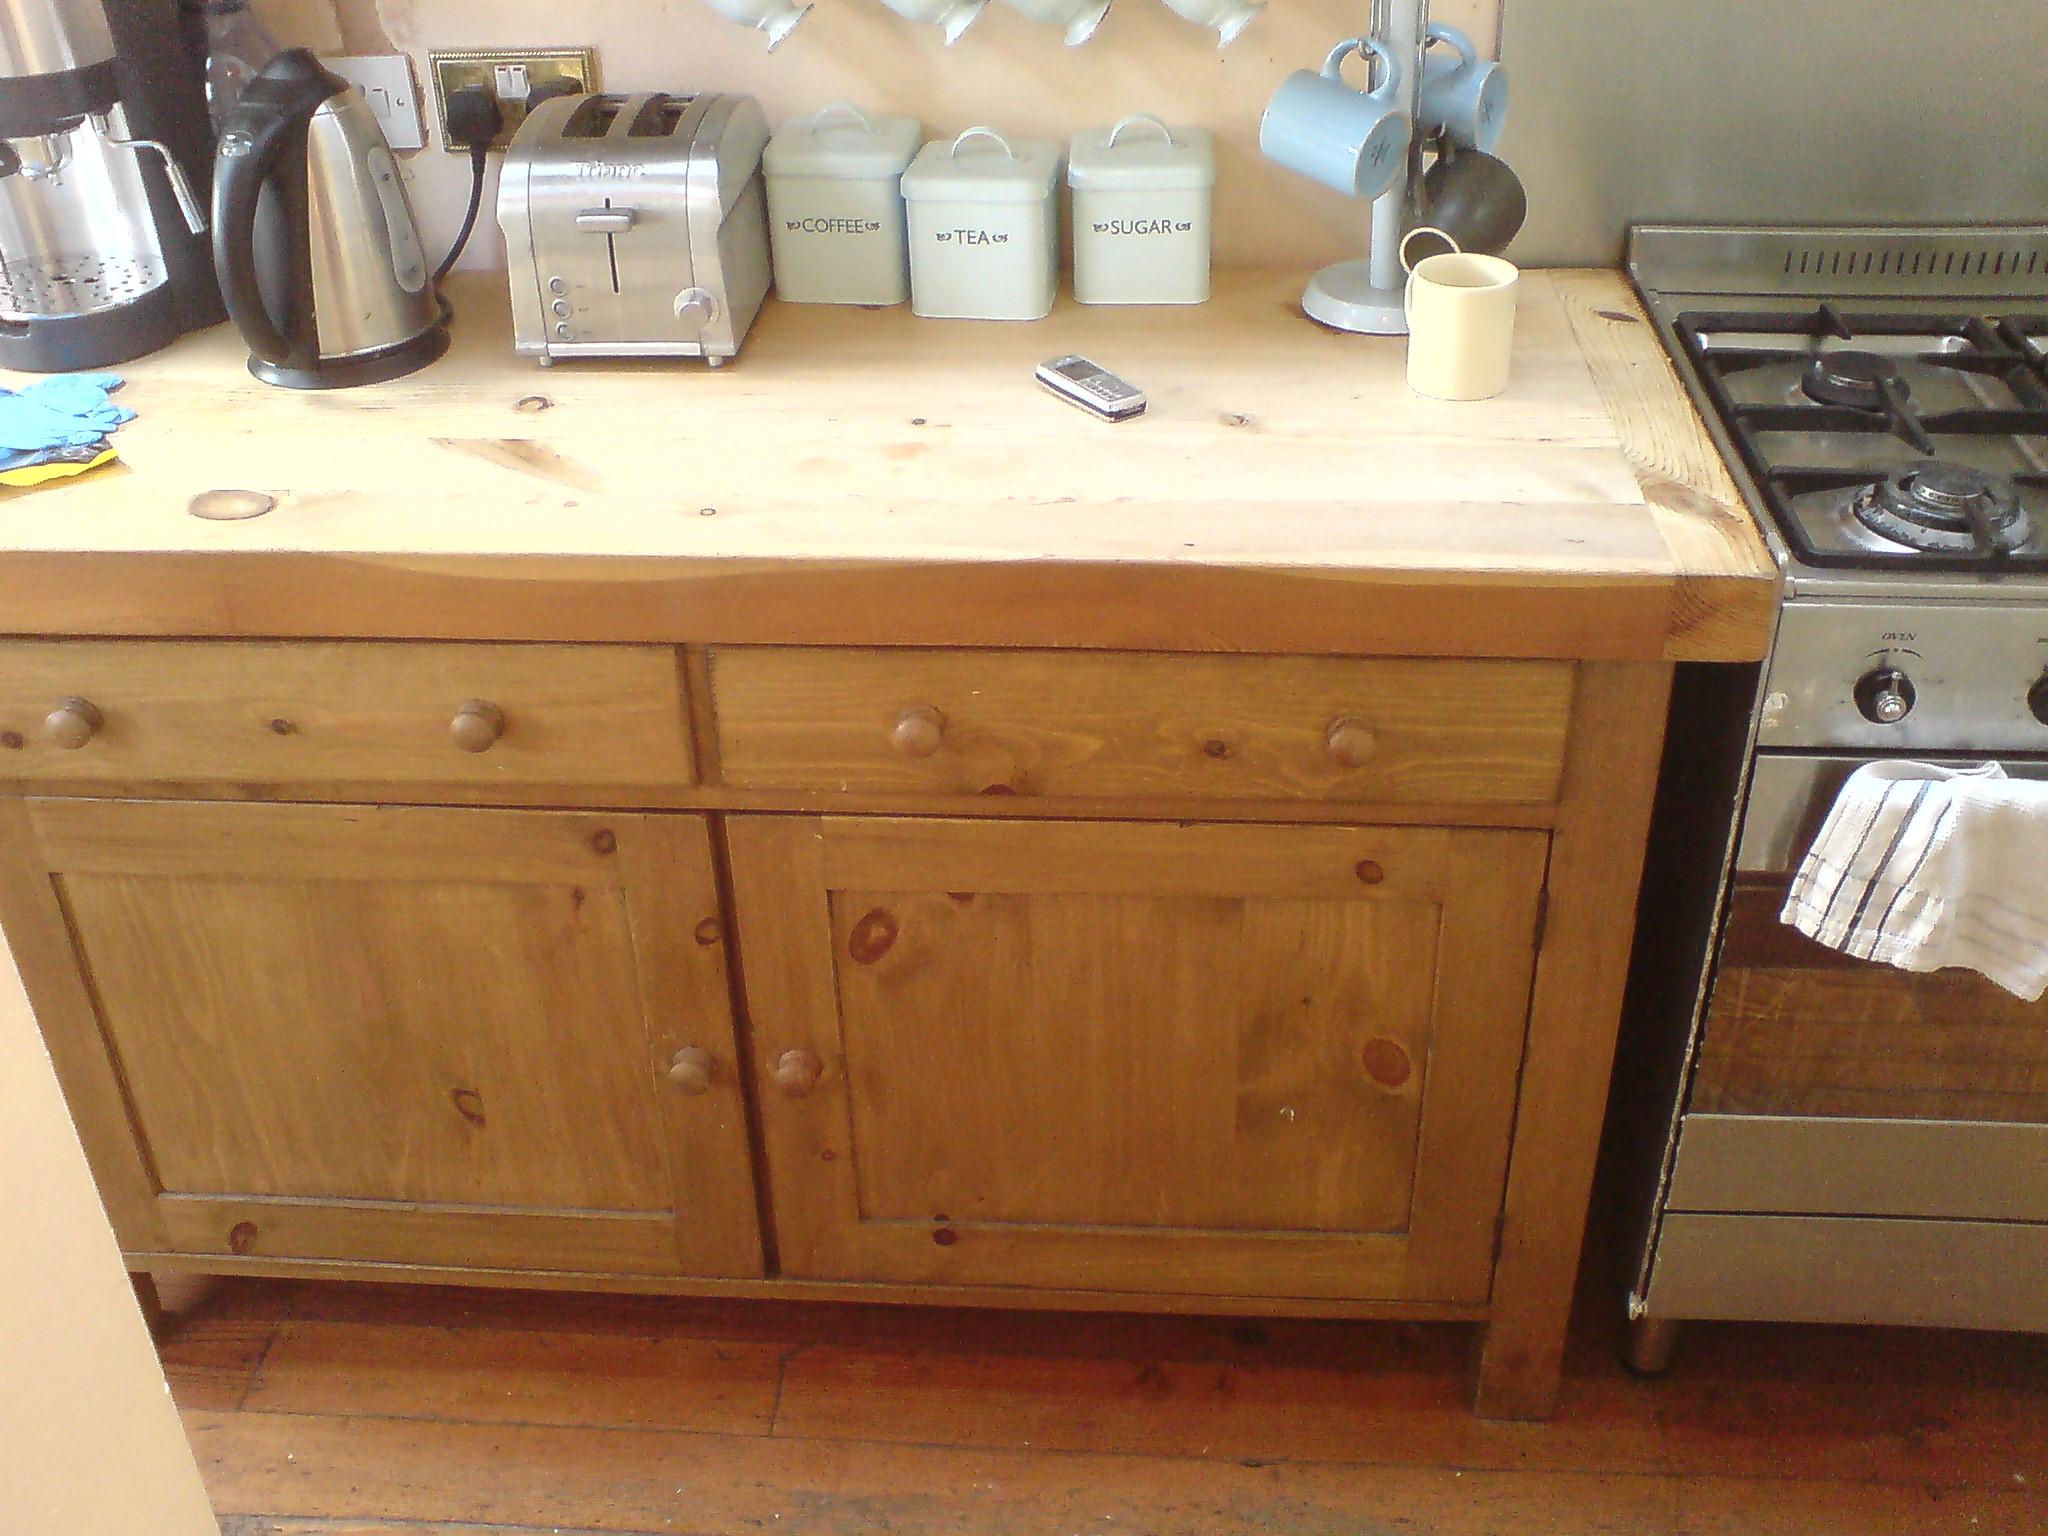 free standing kitchen cabinets with countertops fabulous free standing kitchen cabinet 1000 images about freestanding EPNJSVV